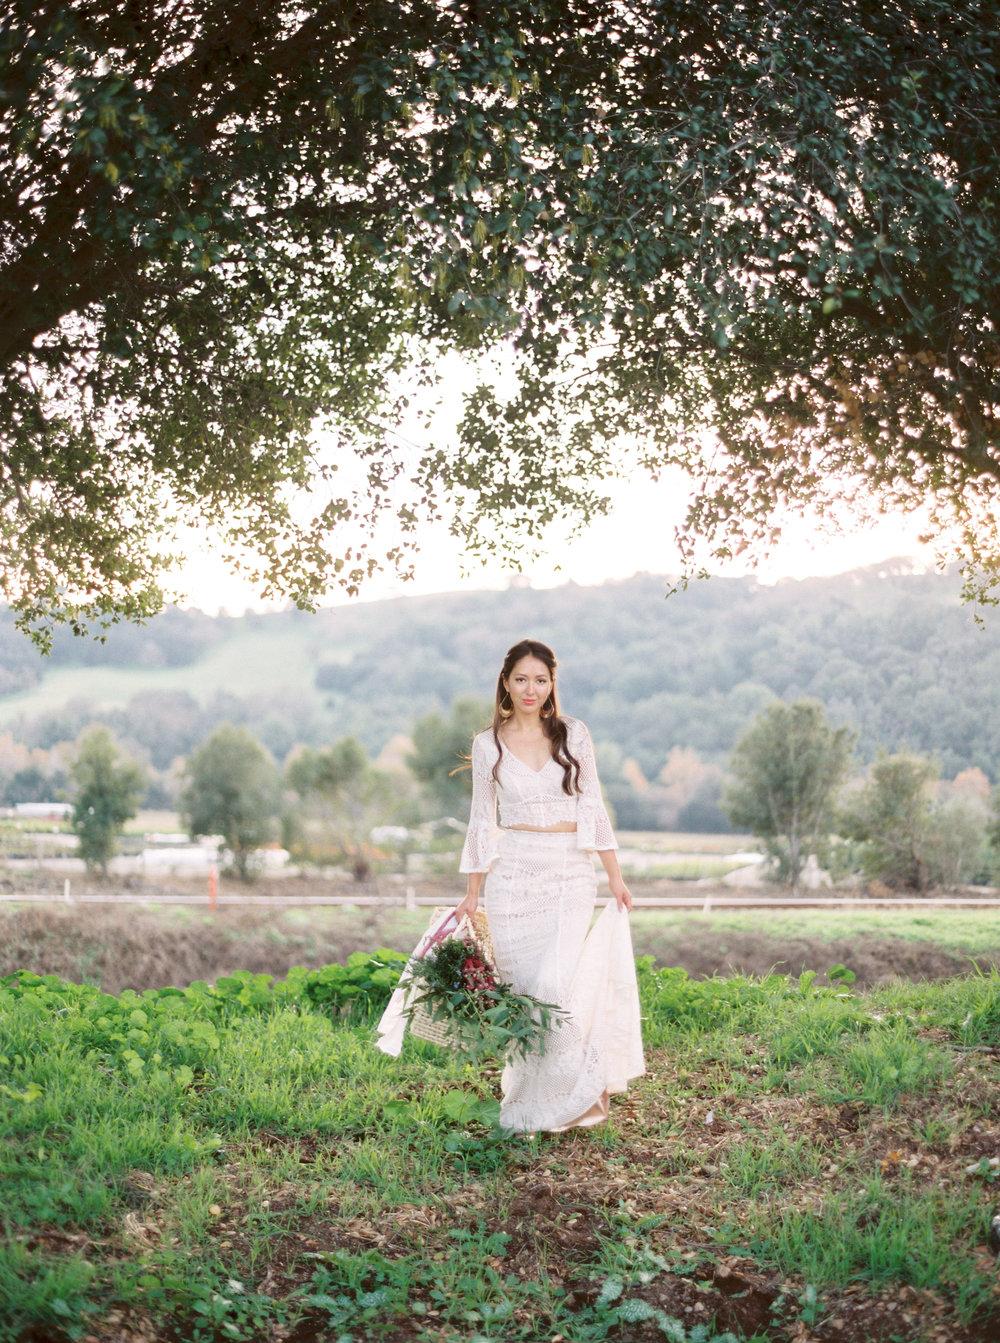 boho-inspired-wedding-at-casa-bella-in-sunol-california-76.jpg